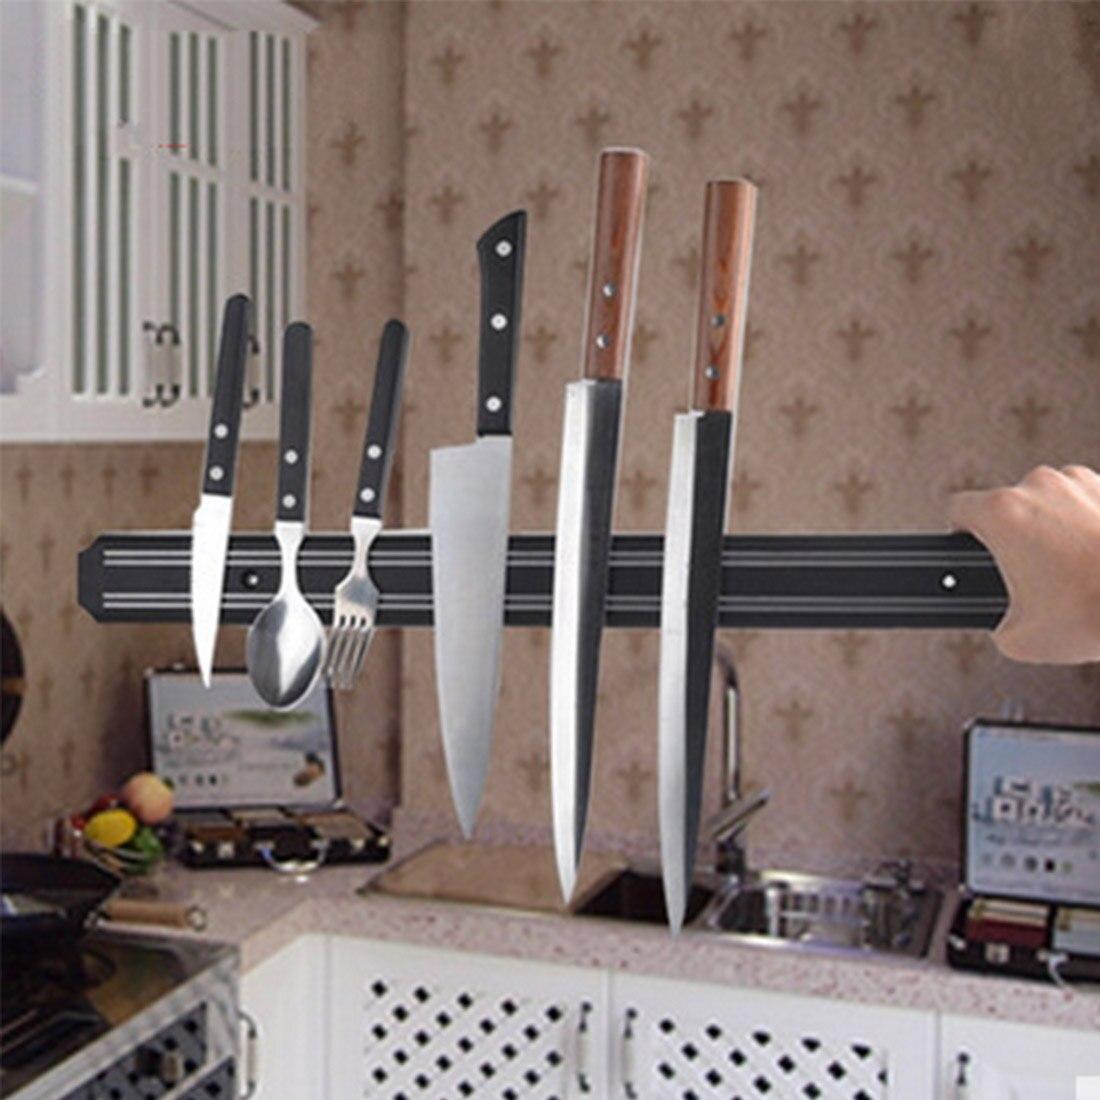 330x34x15mm Magnetic Knife Holder Wall Mount Black ABS Placstic Block Magnet Knife Holder For Metal Knife